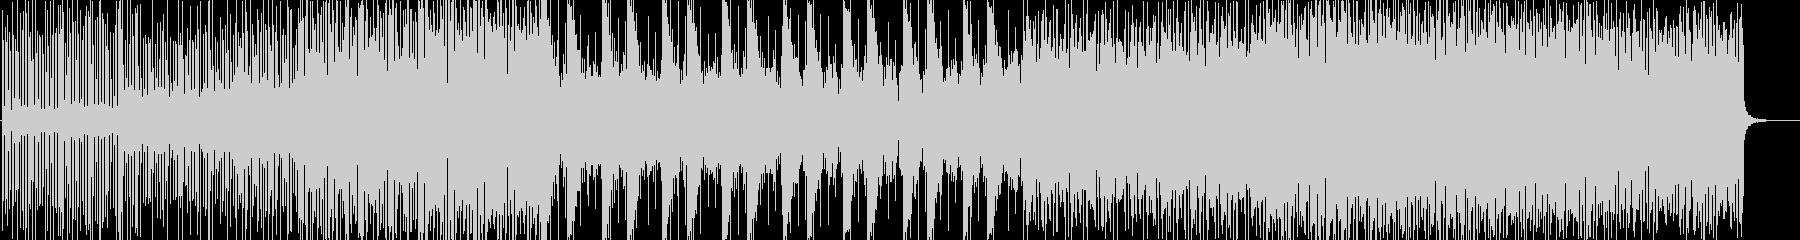 WAVE 16bit 44.1khzの未再生の波形